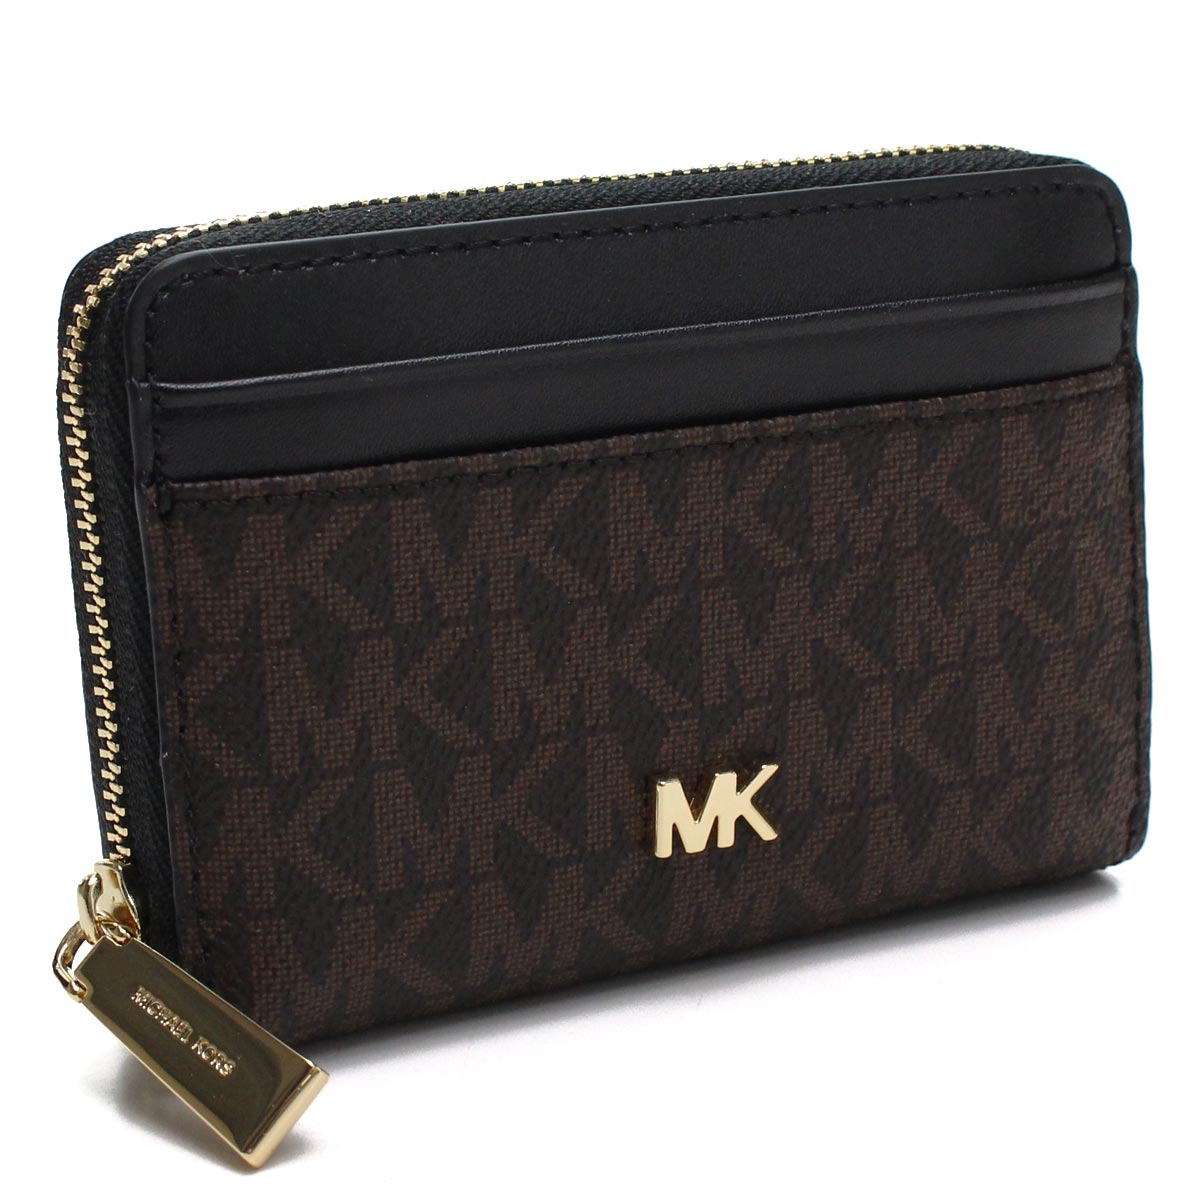 3daac7cd60c7 Bighit The total brand wholesale: Black of Michael Kors MICHAEL KORS MONEY  PIECES coin purse 32F8GF6Z1B 292 BROWN/BLK Brown line   Rakuten Global  Market